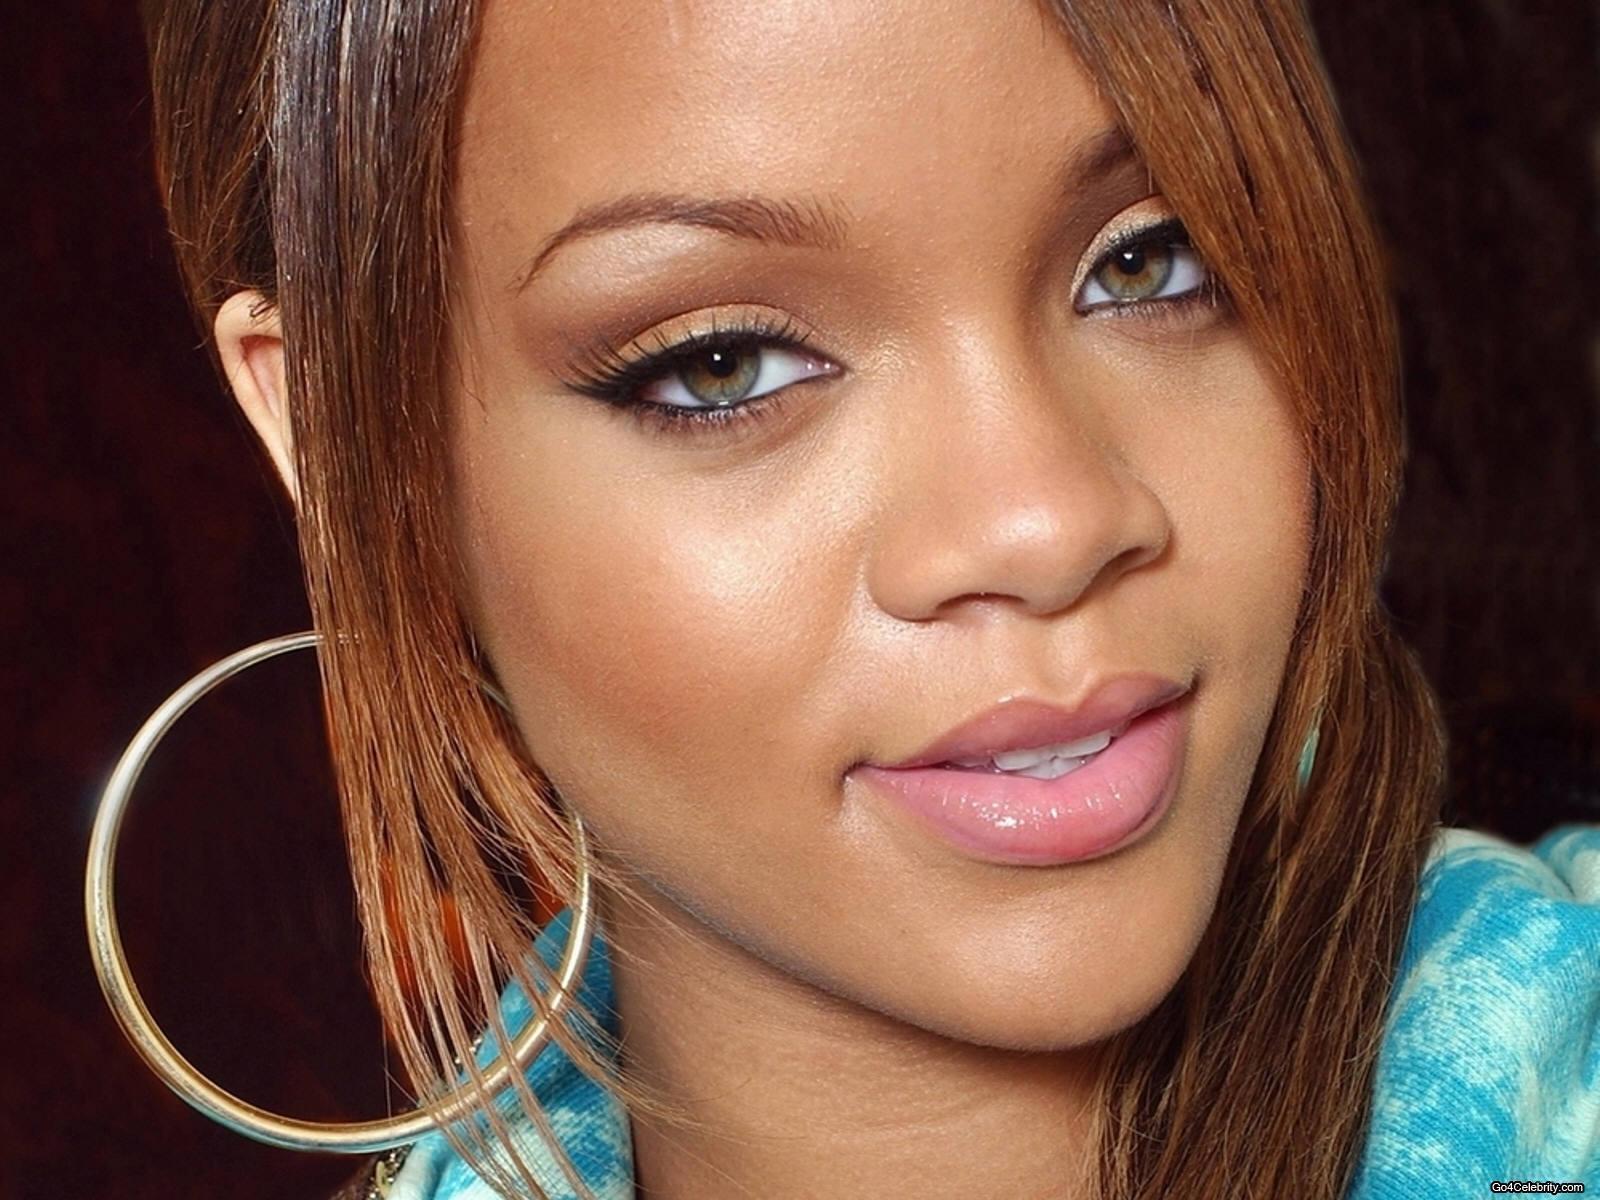 Rihanna - Rihanna Wallpaper (6848192) - Fanpop Rihanna